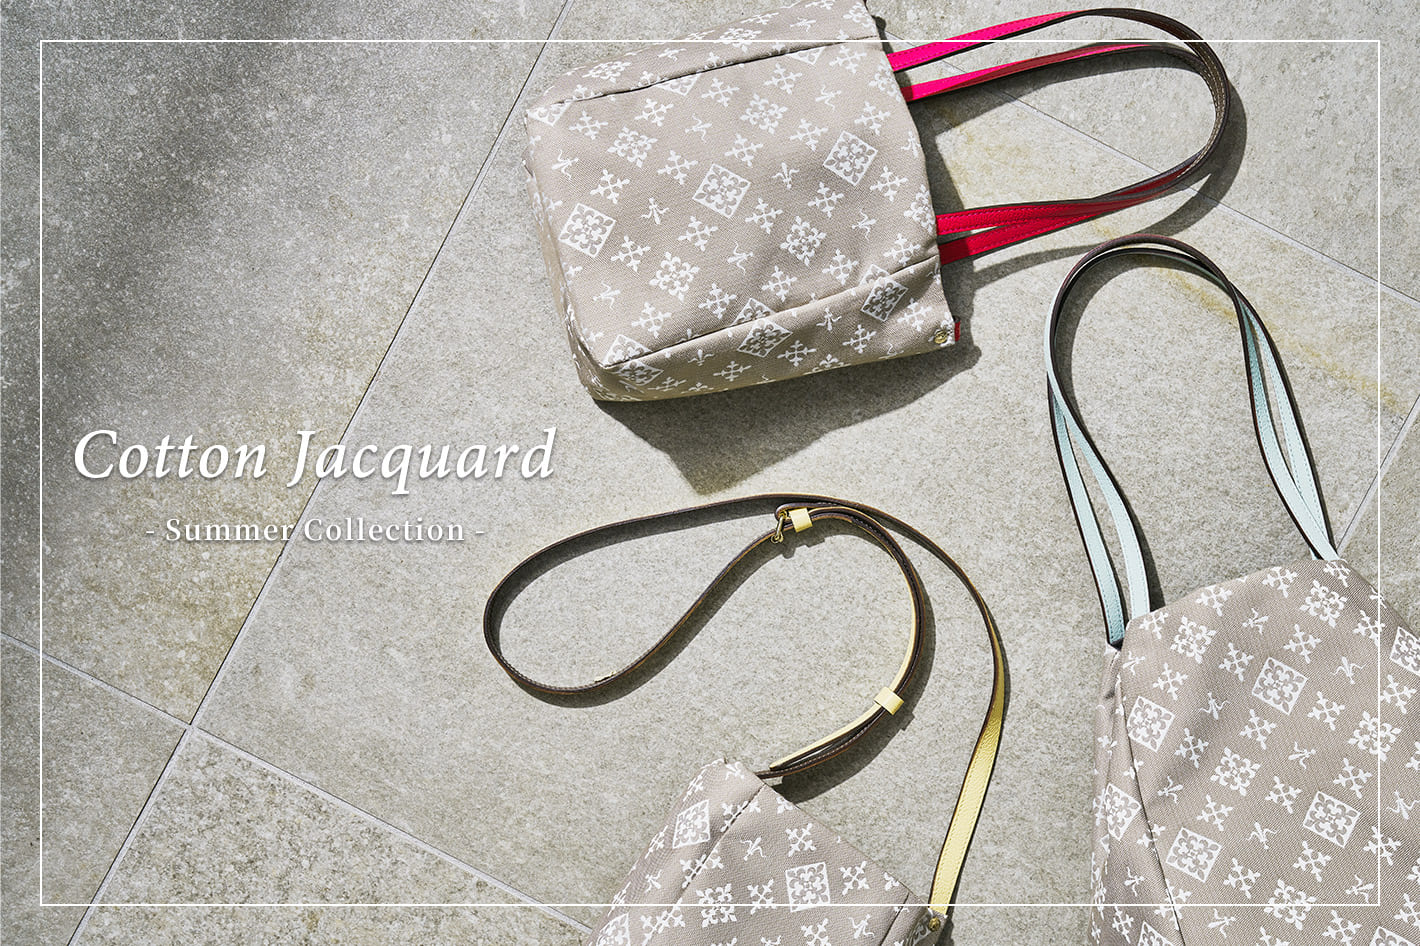 russet Cotton Jacquard -Summer Collection-